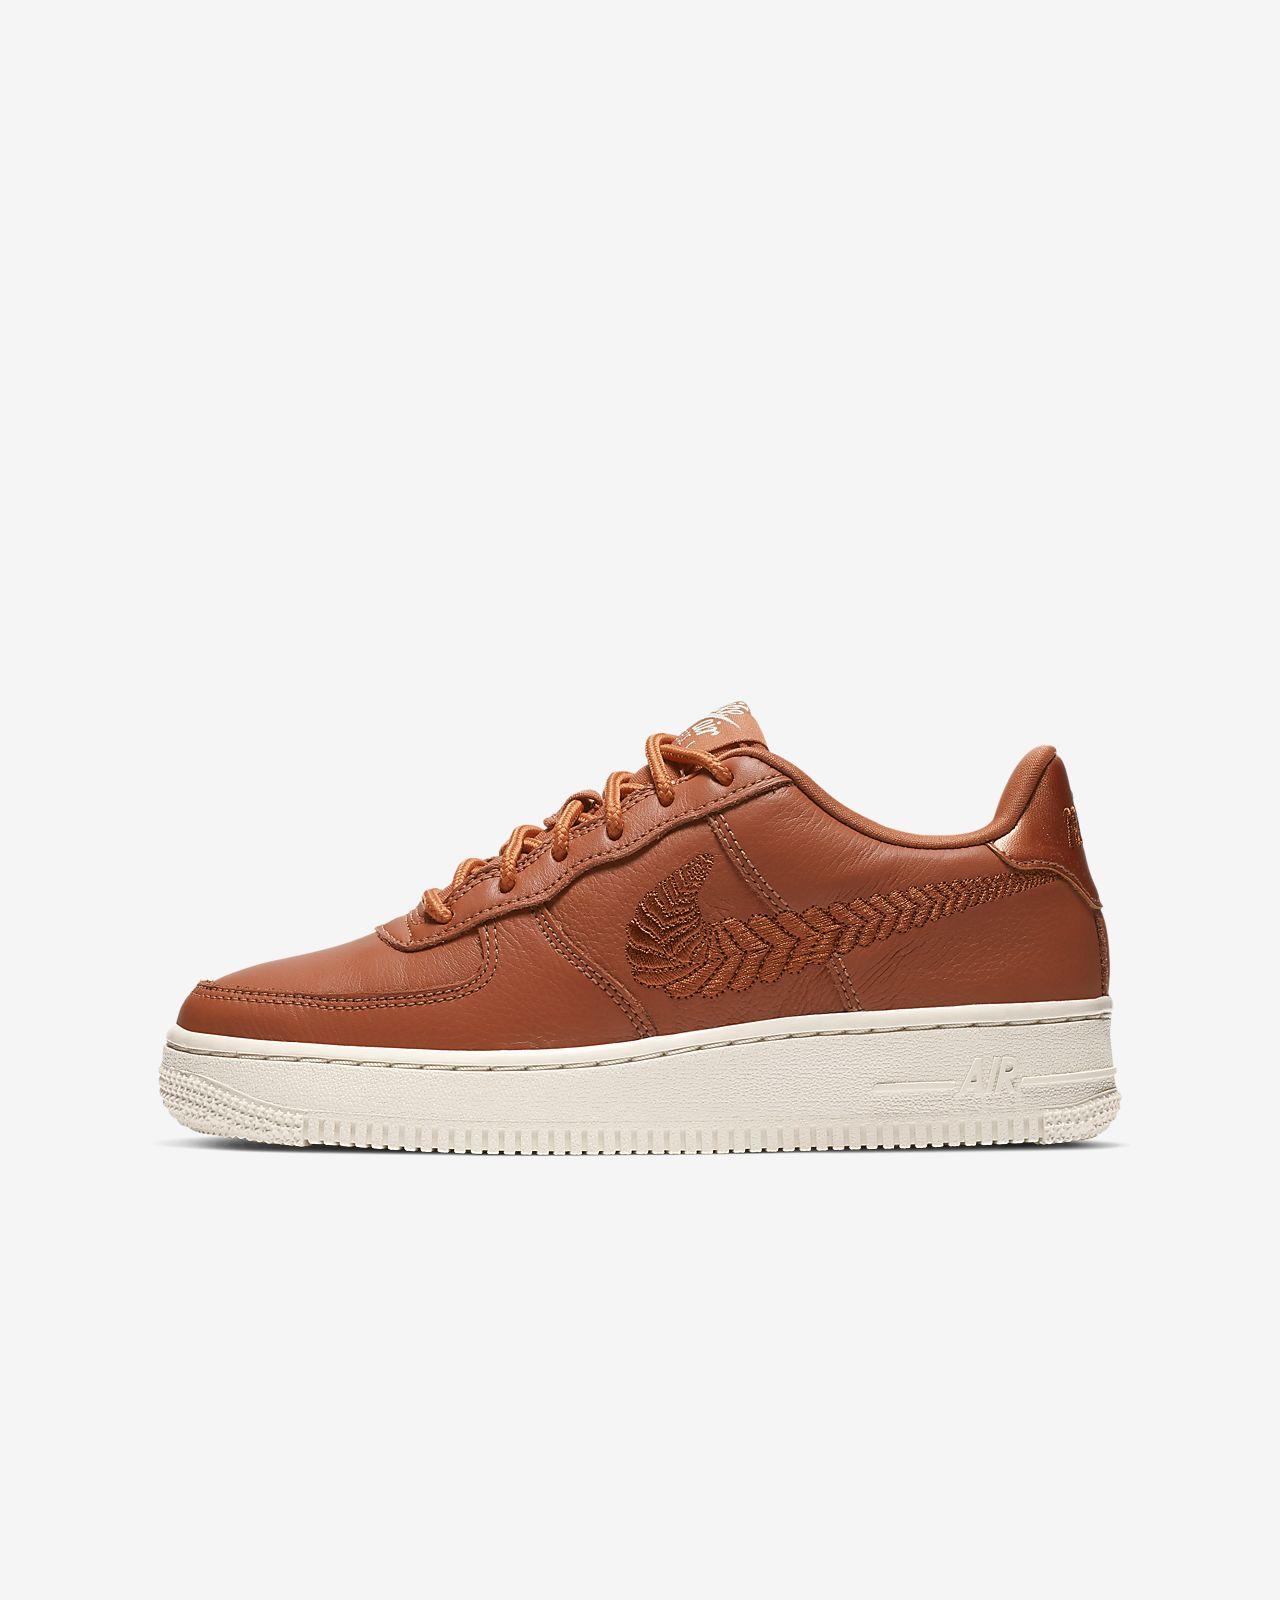 size 40 f649b 56e01 ... Nike Air Force 1 Premium Embroidered Sabatilles - Nena